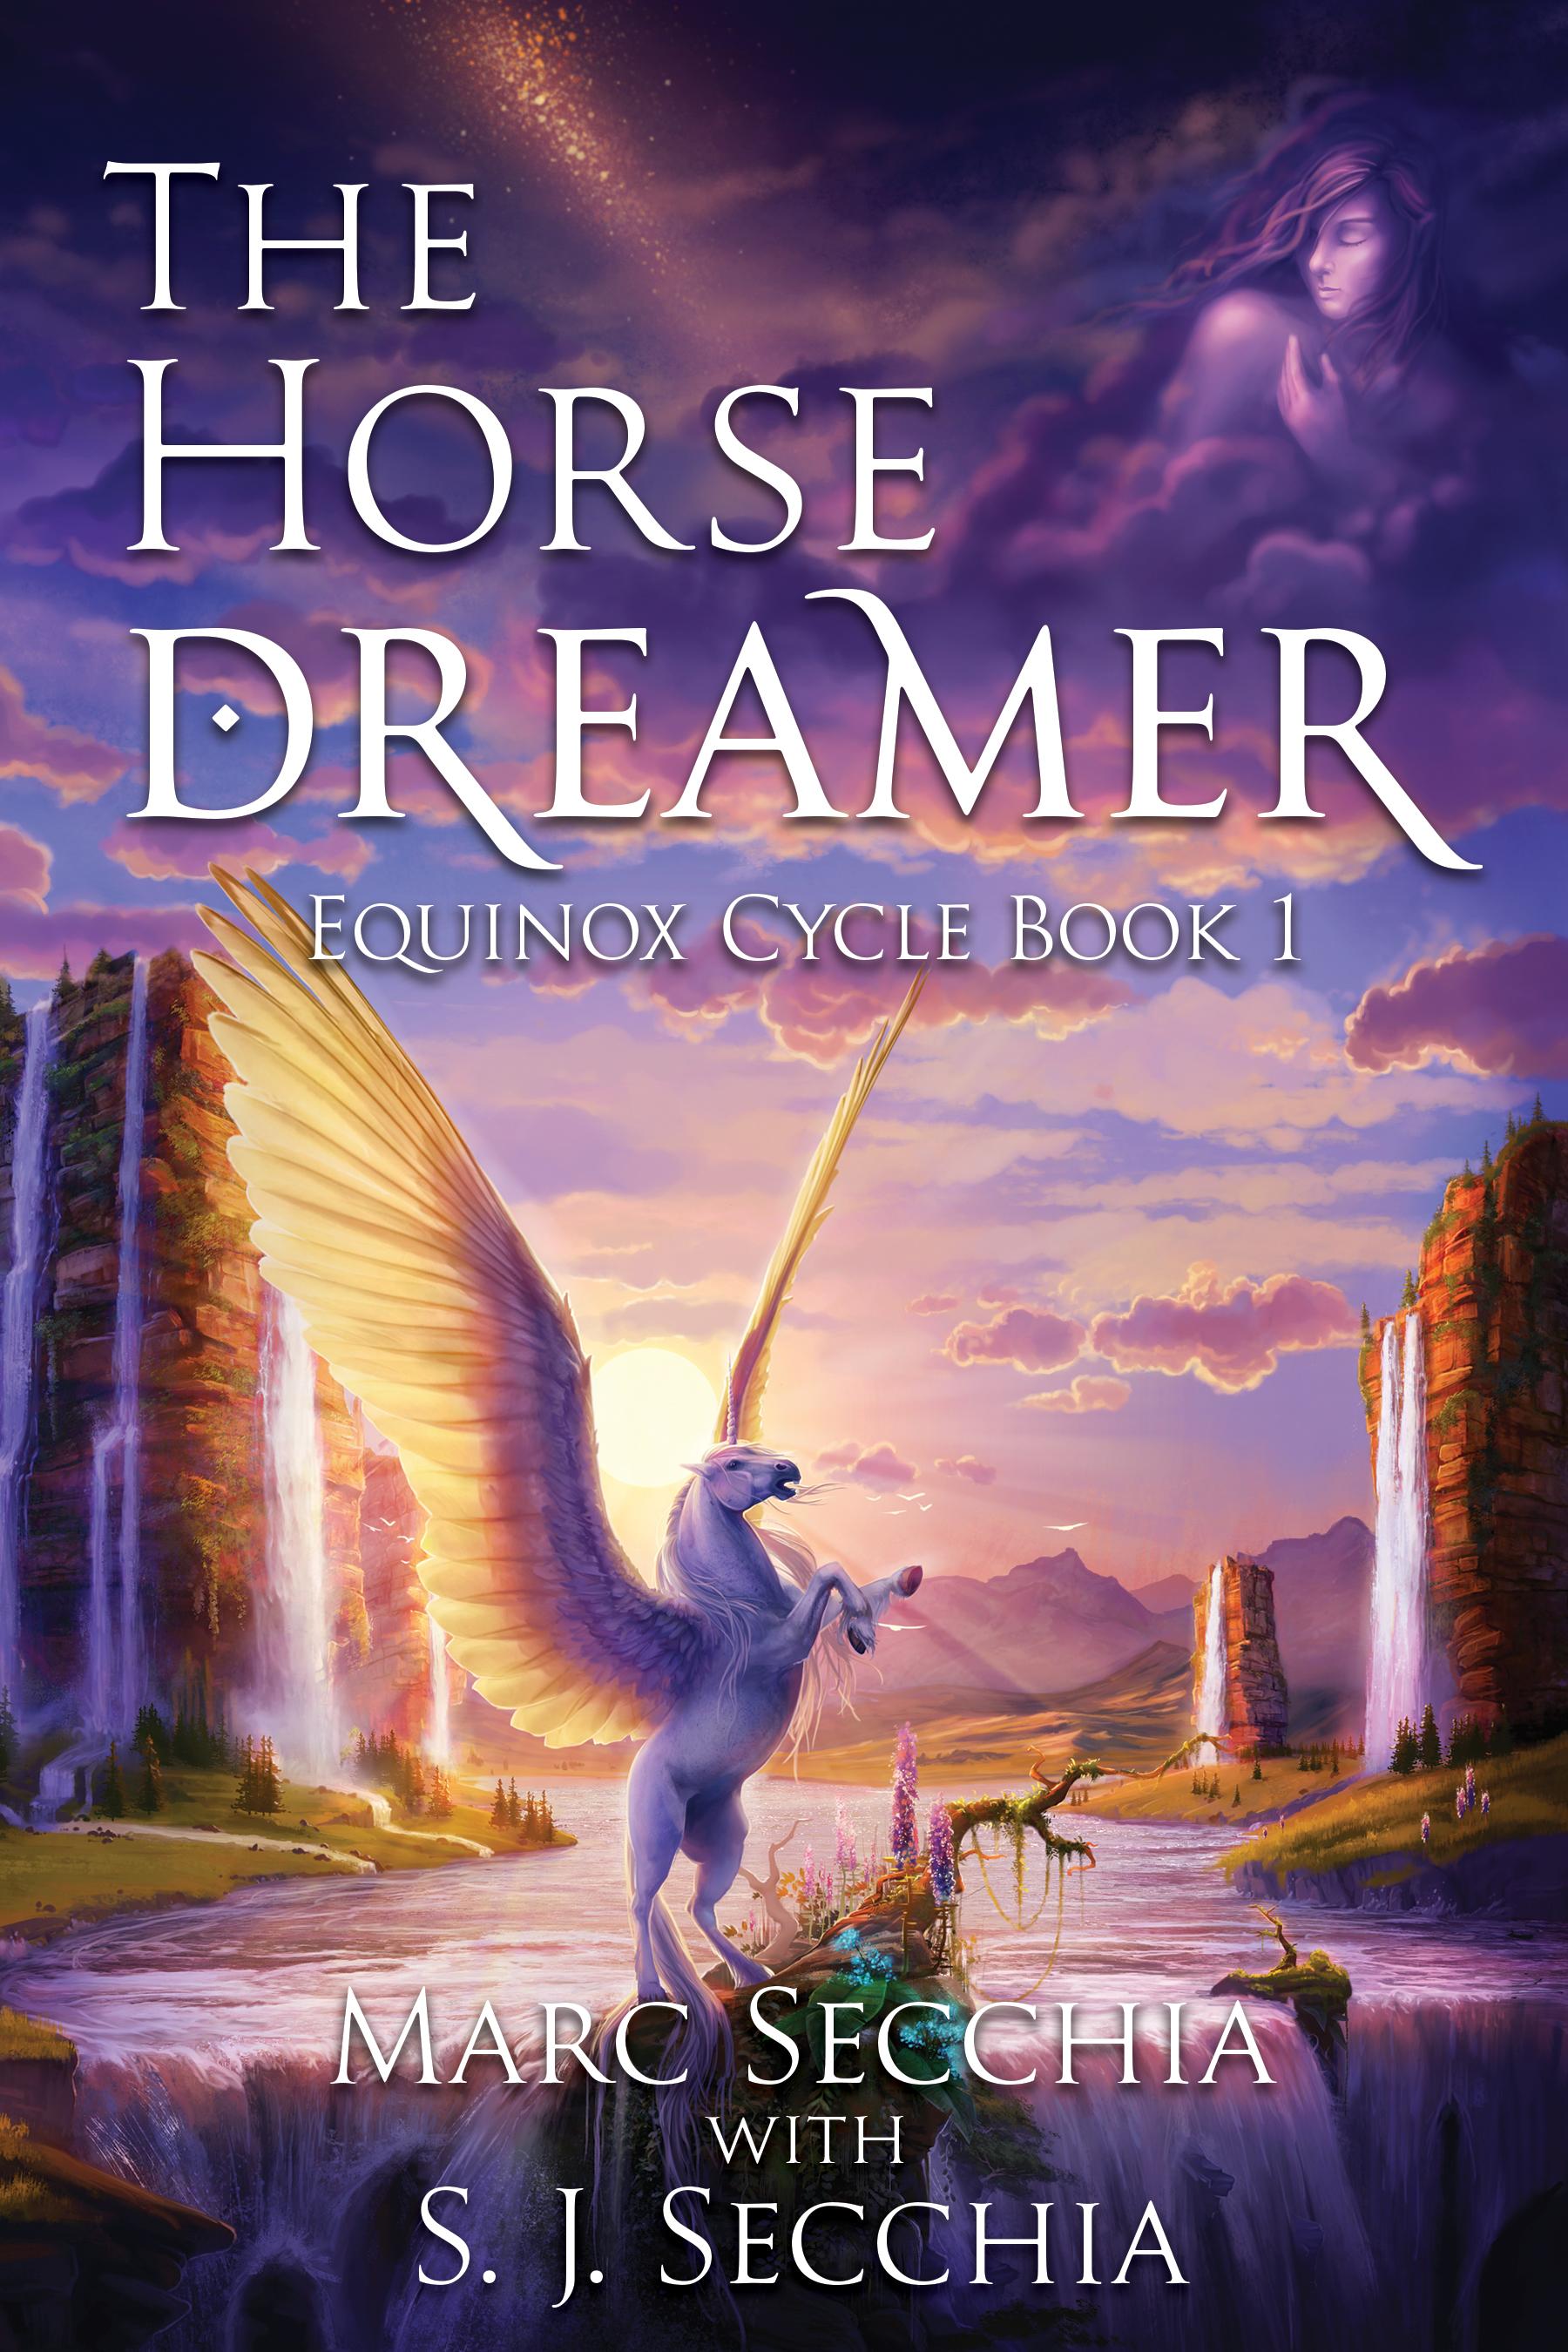 The horse dreamer